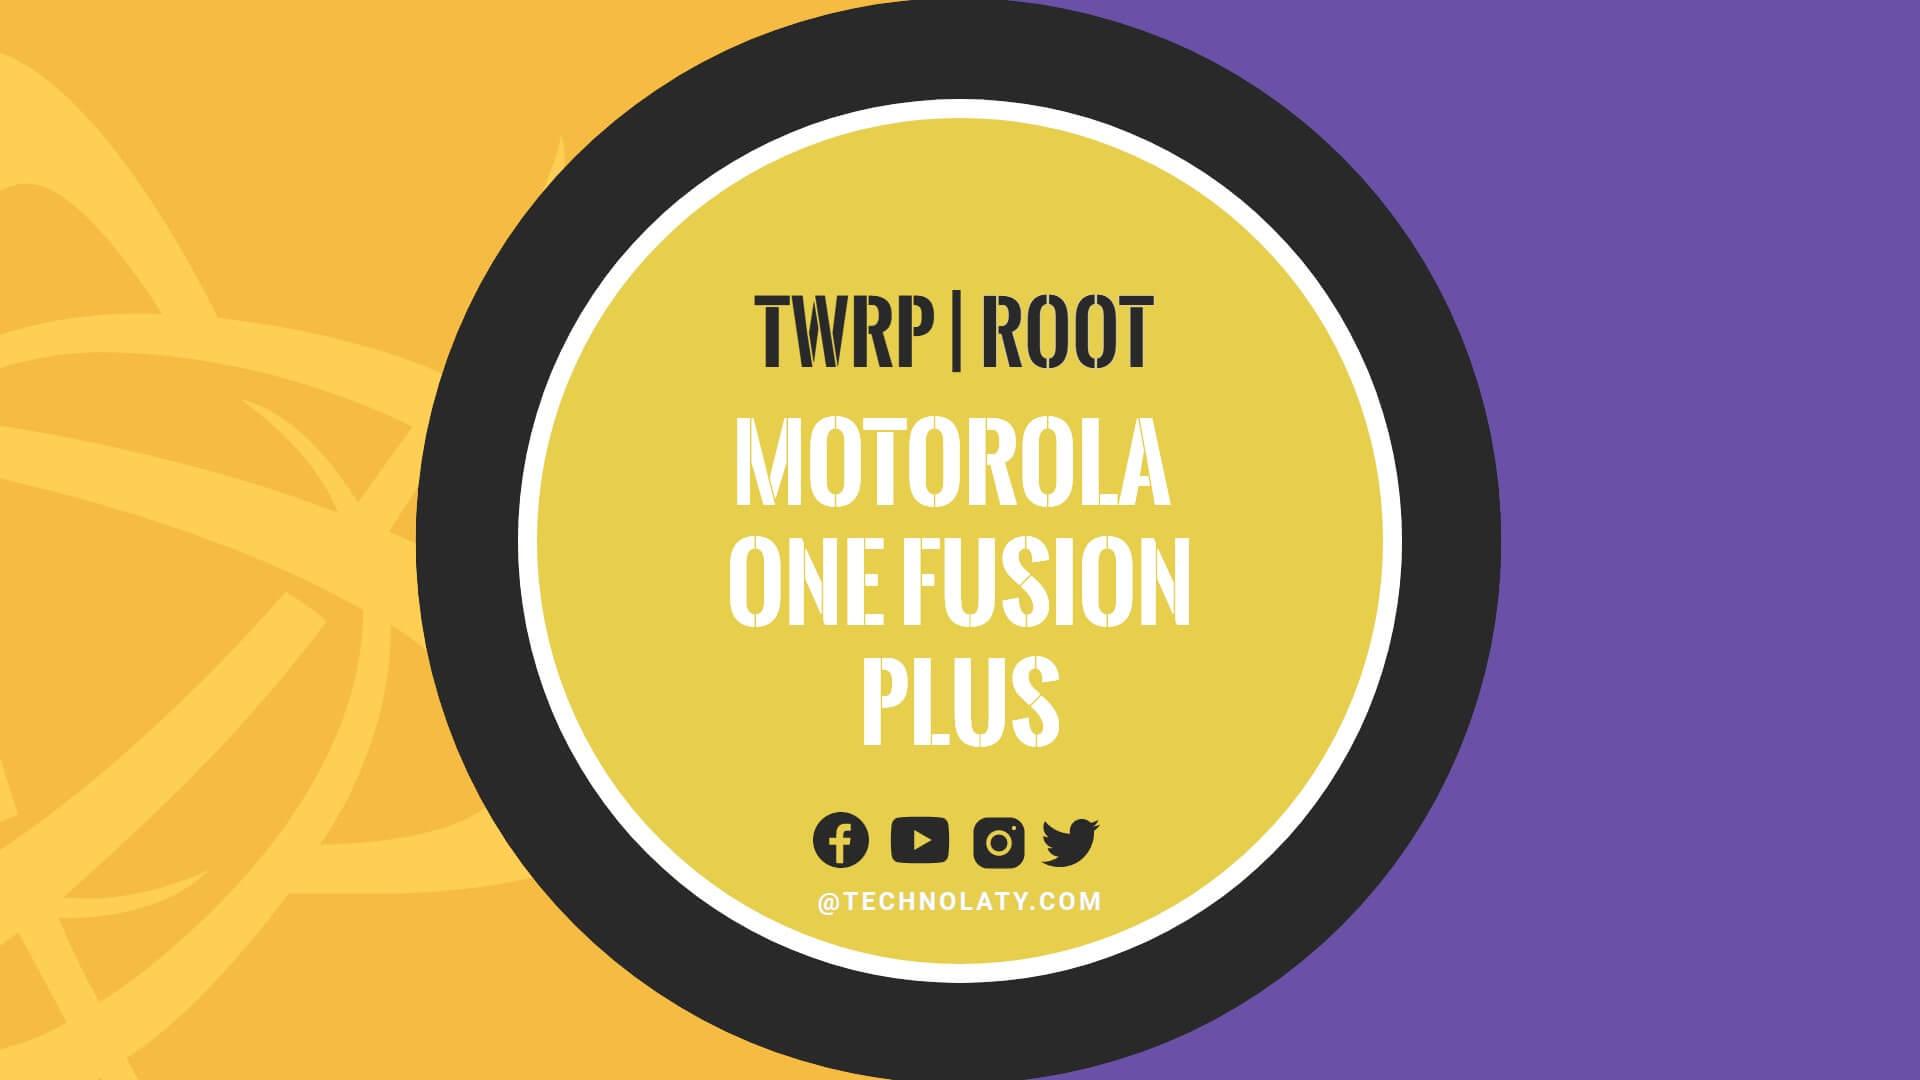 TWRP for Motorola One Fusion Plus